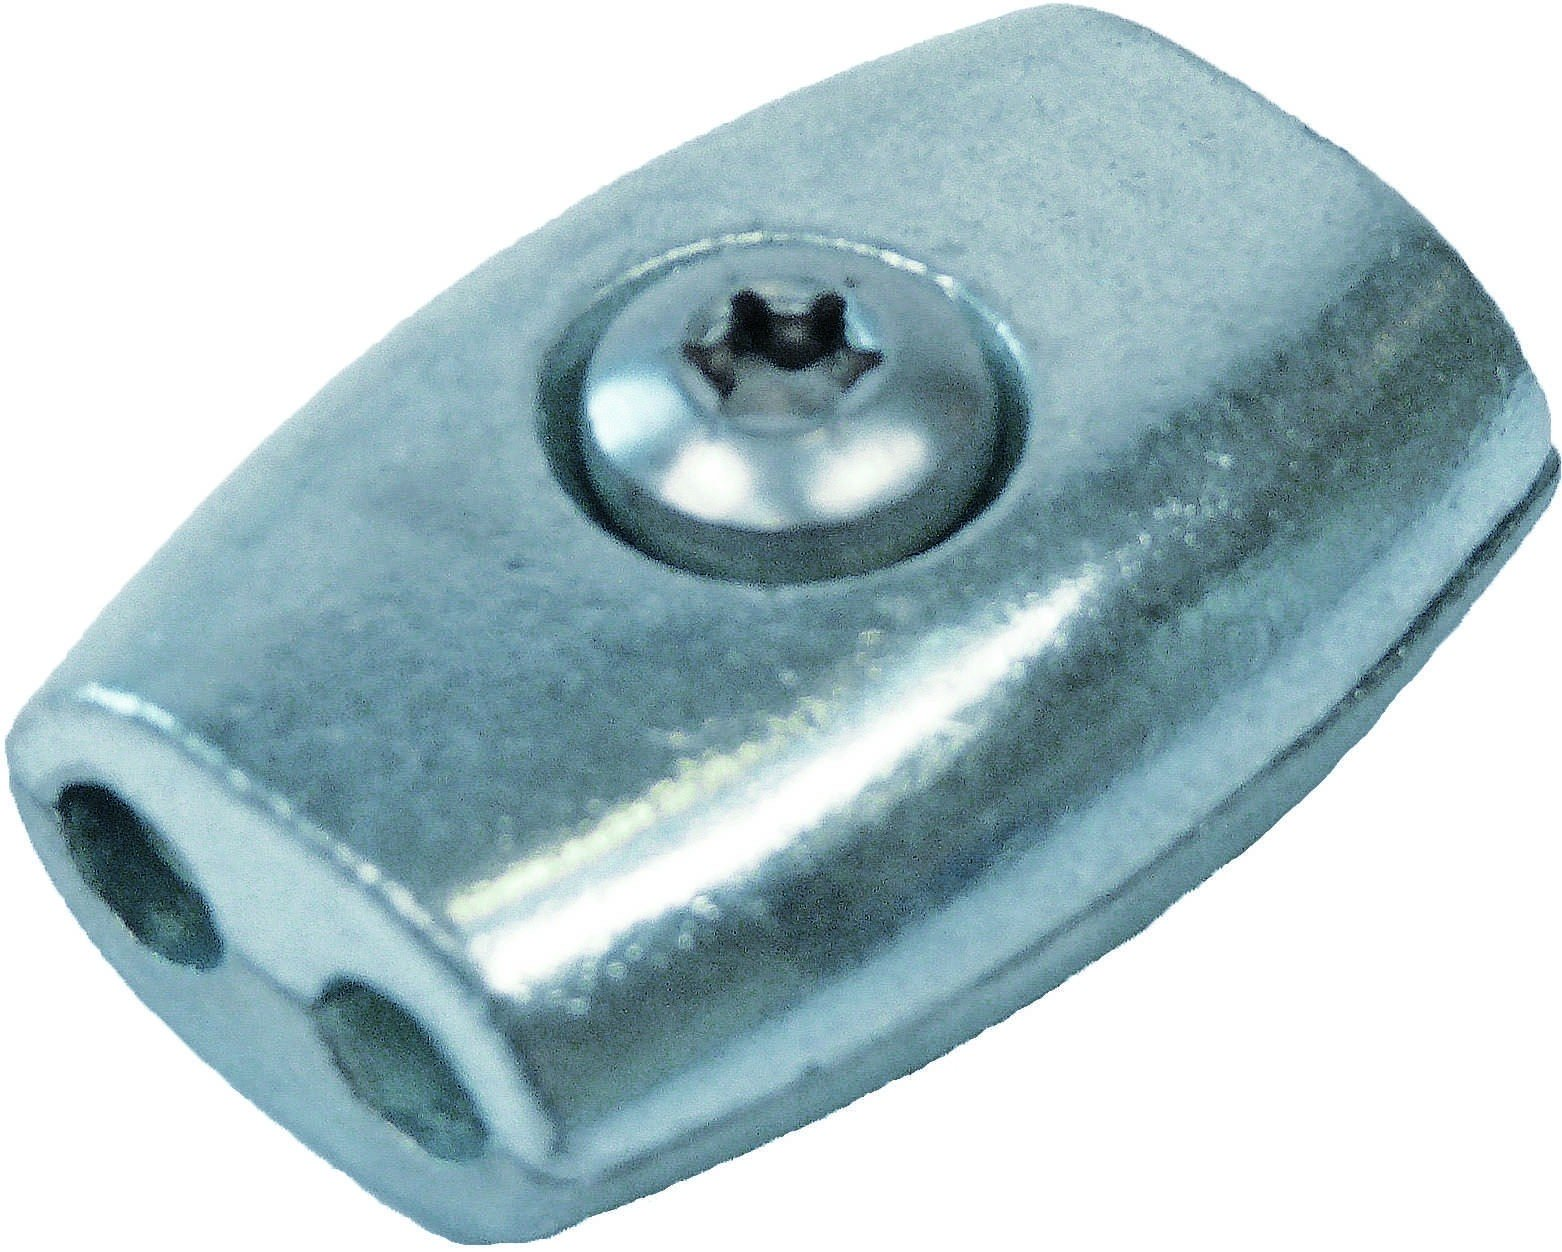 Staaldraadklem eivormig 4mm RVS A4 1 stuks